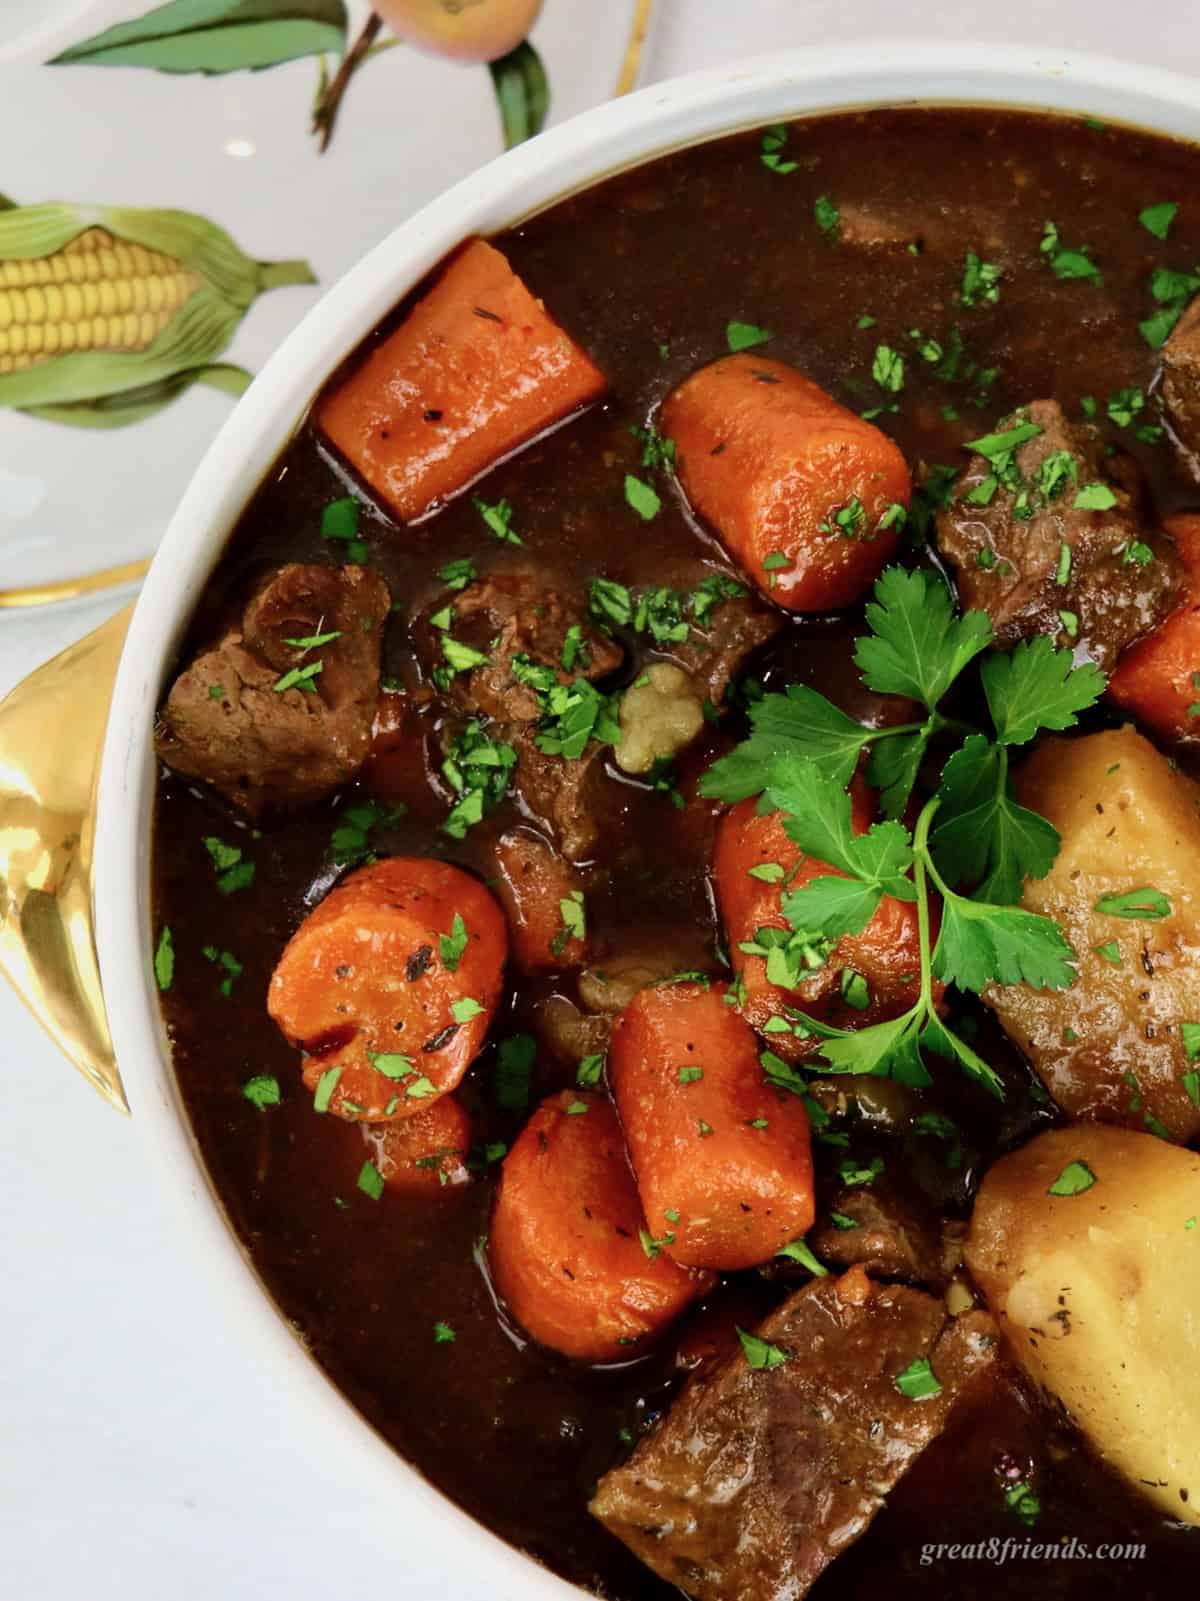 Overhead shot of Irish beef stew in a ceramic serving dish.